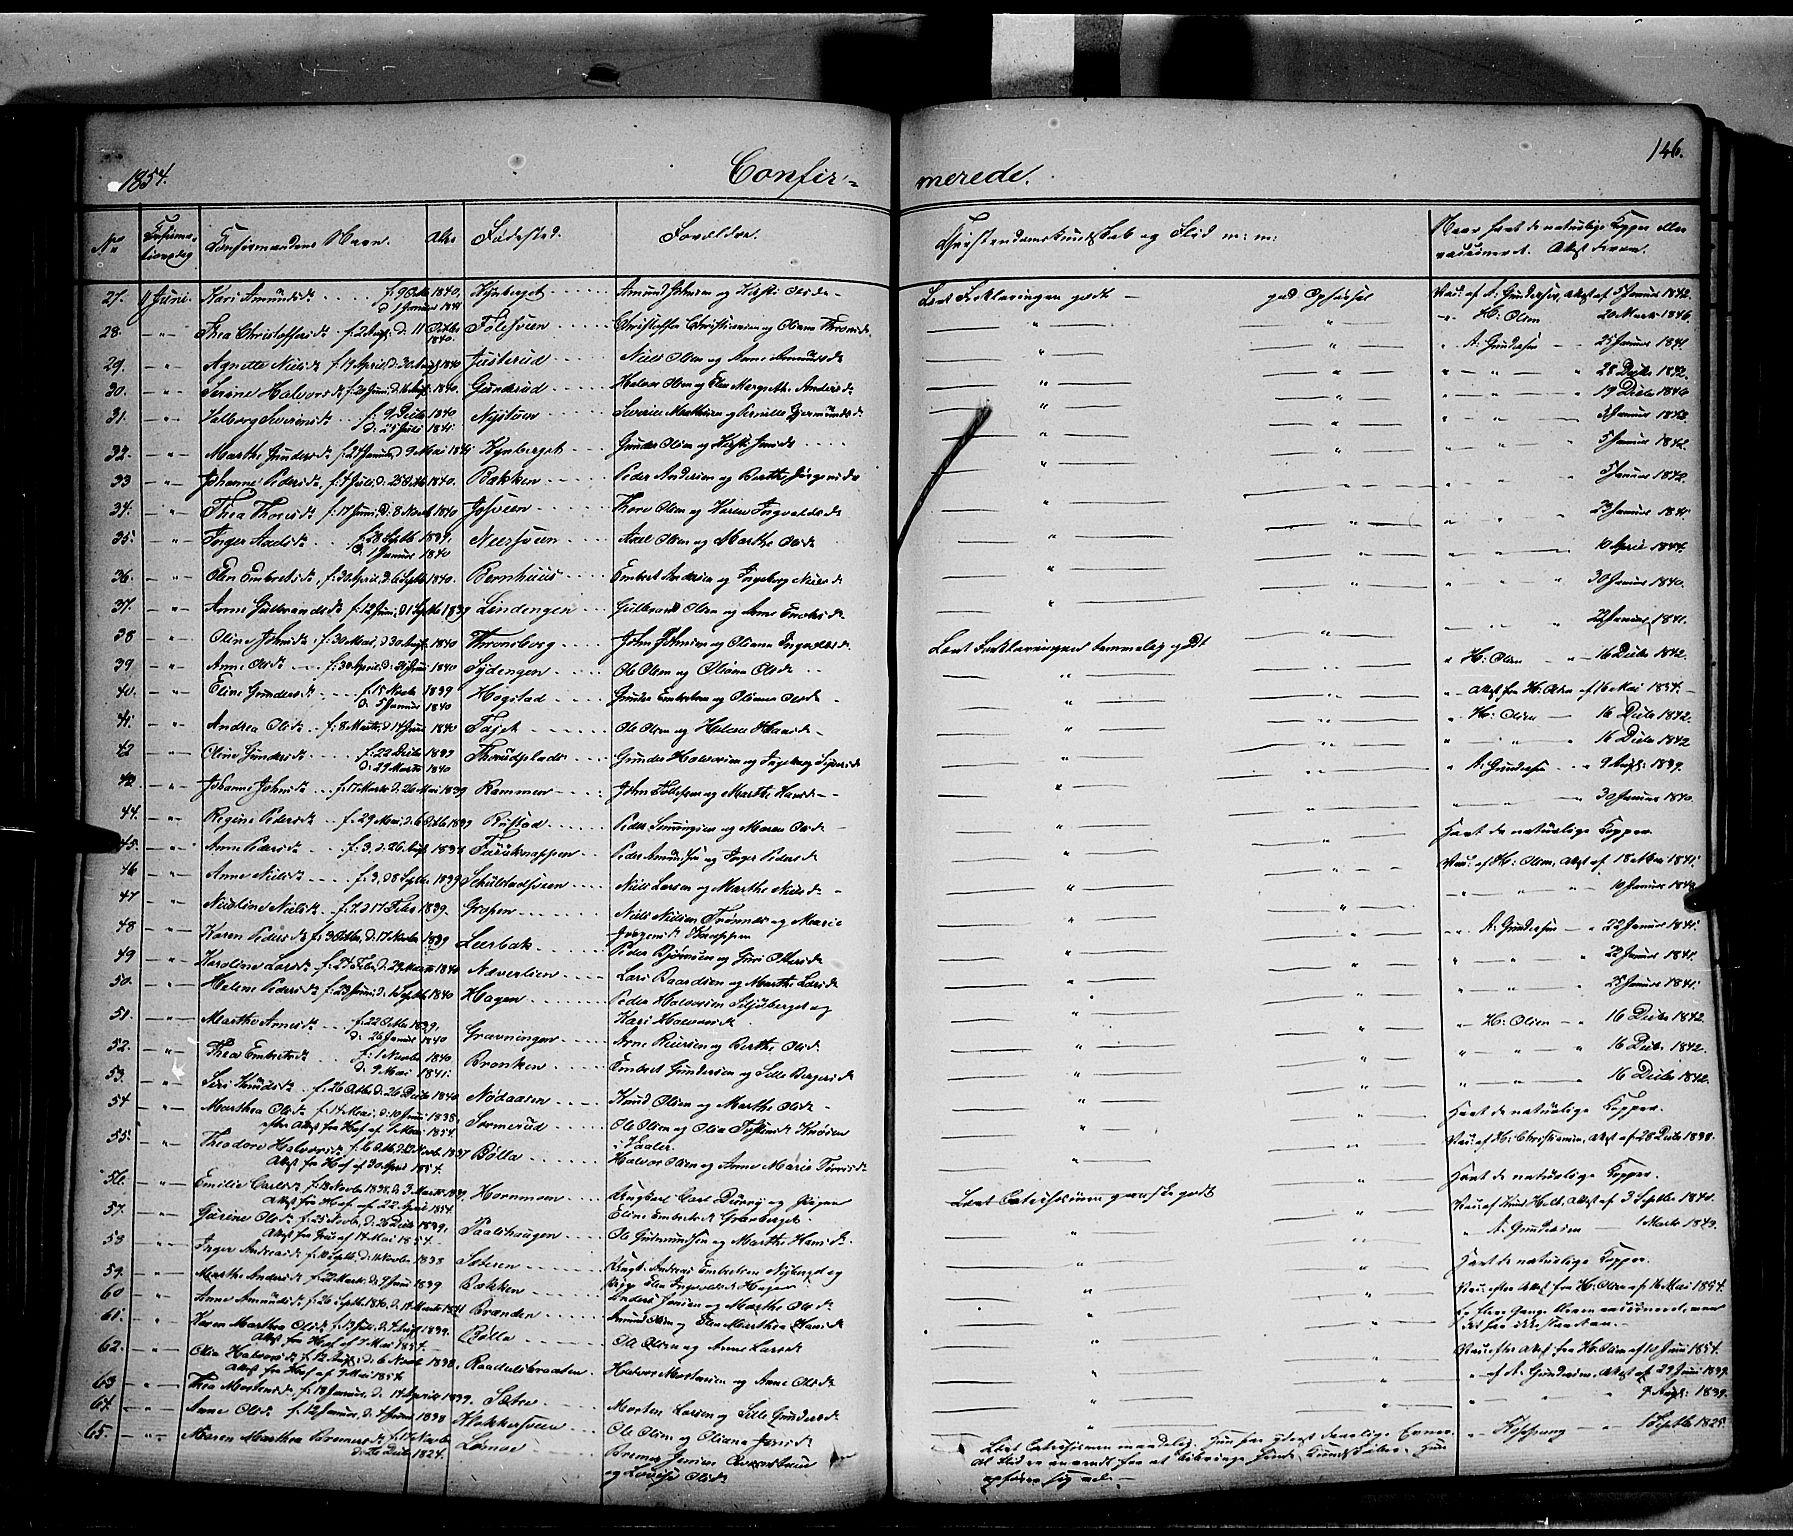 SAH, Elverum prestekontor, H/Ha/Haa/L0009: Ministerialbok nr. 9, 1843-1856, s. 146